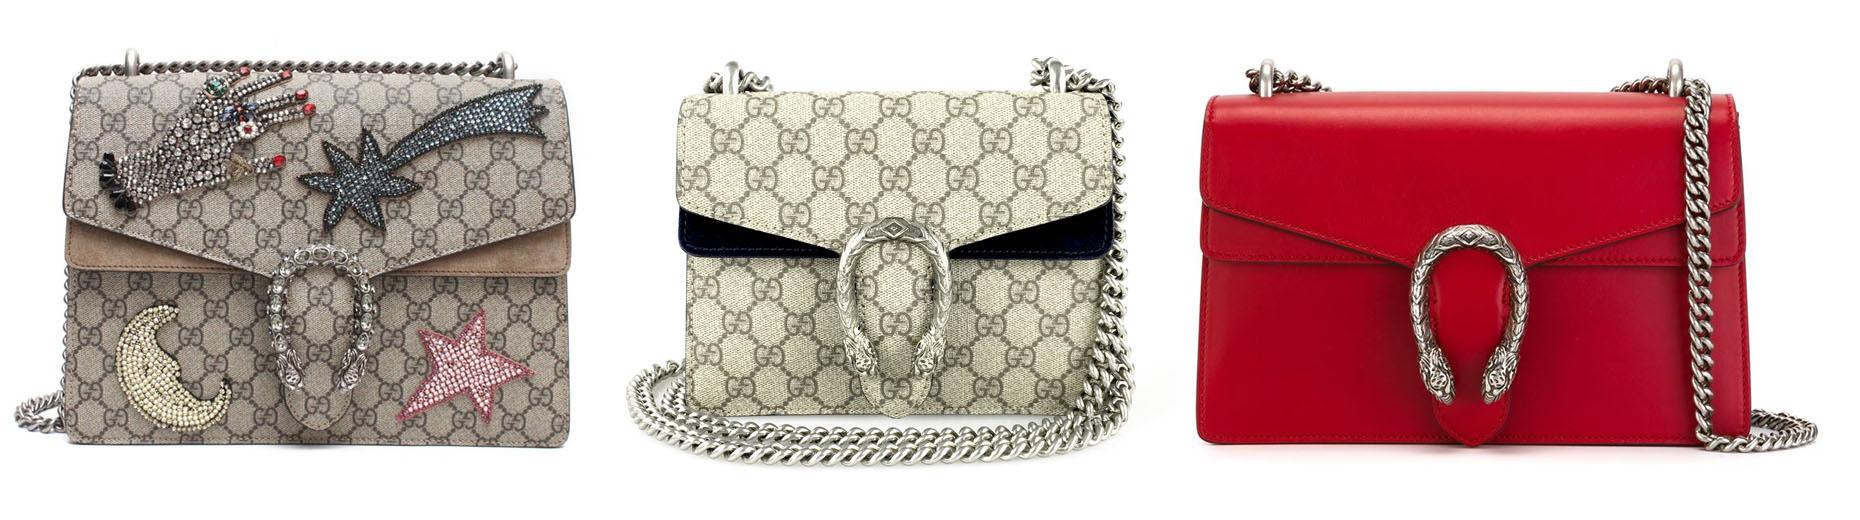 Iconic-сумки XXI века: 7 достойных замен Hermes Birkin